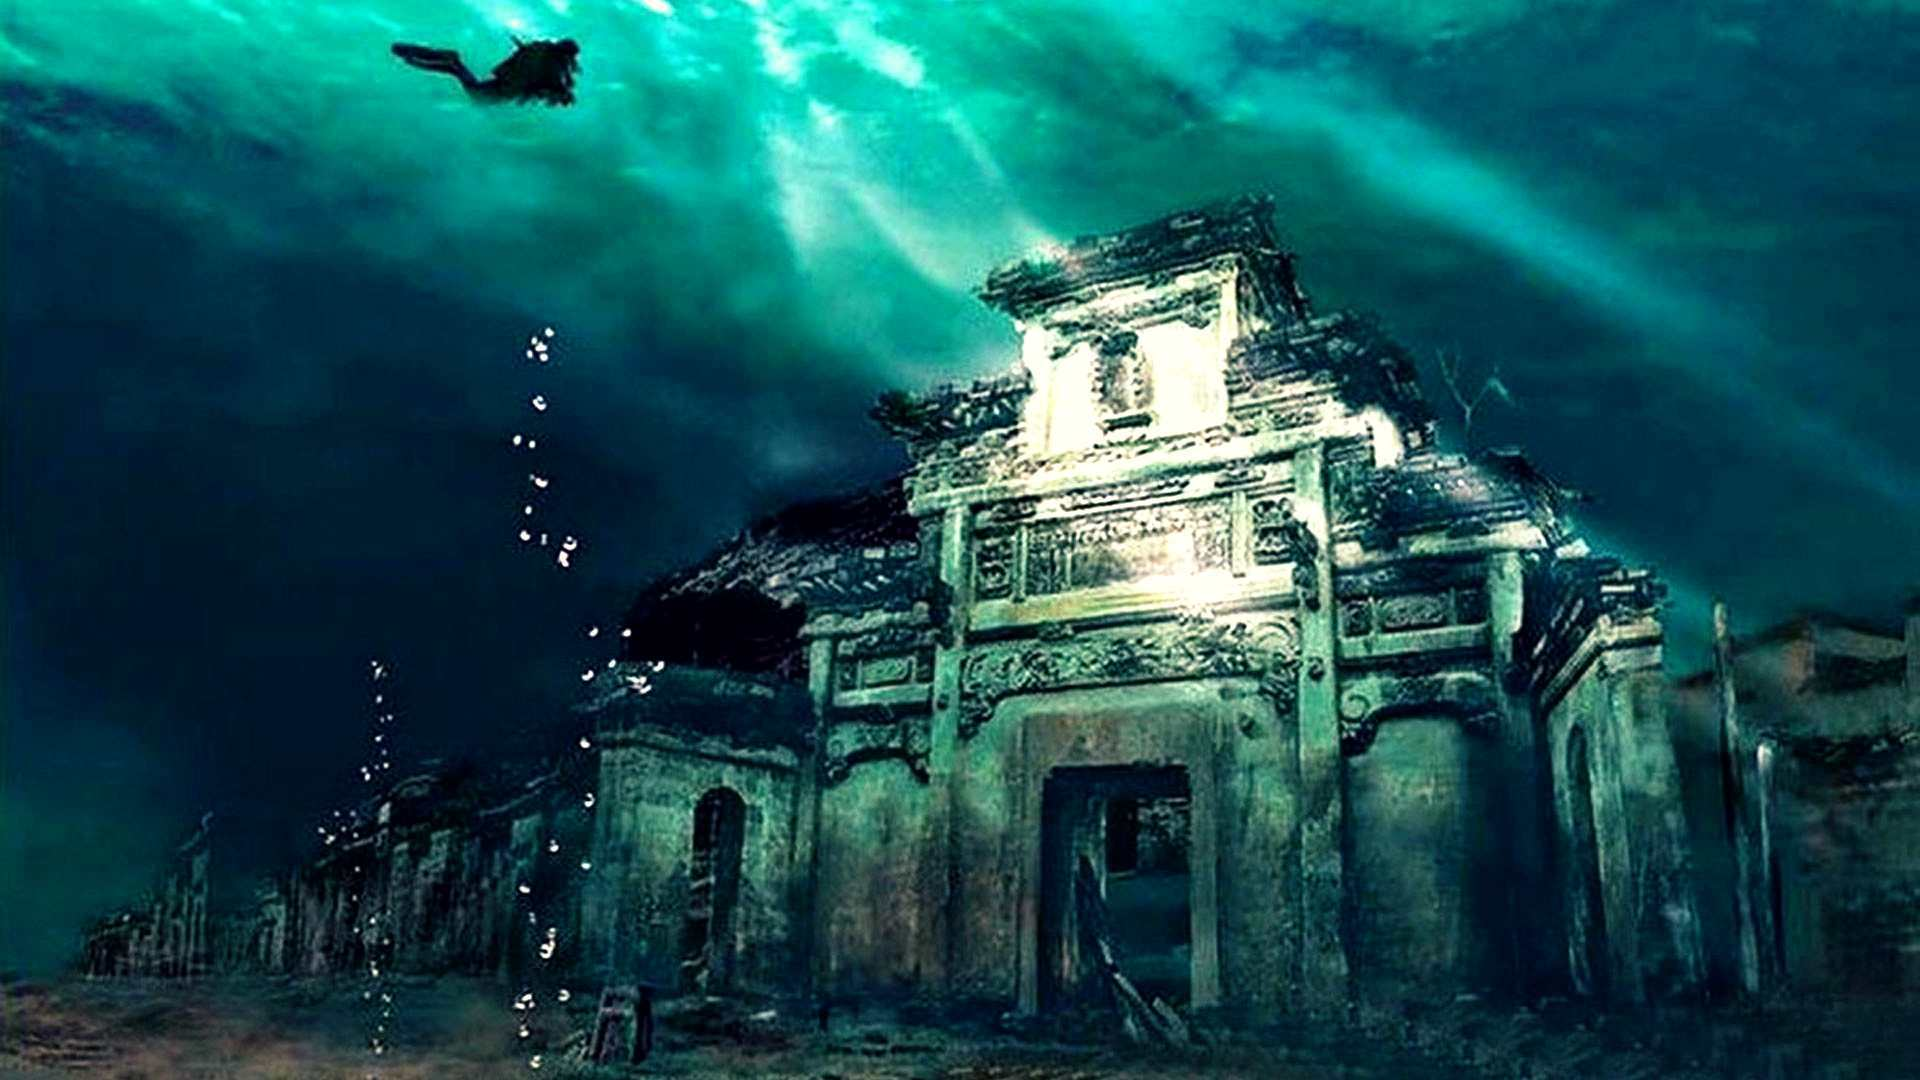 Onderwaterstad In Shicheng, China